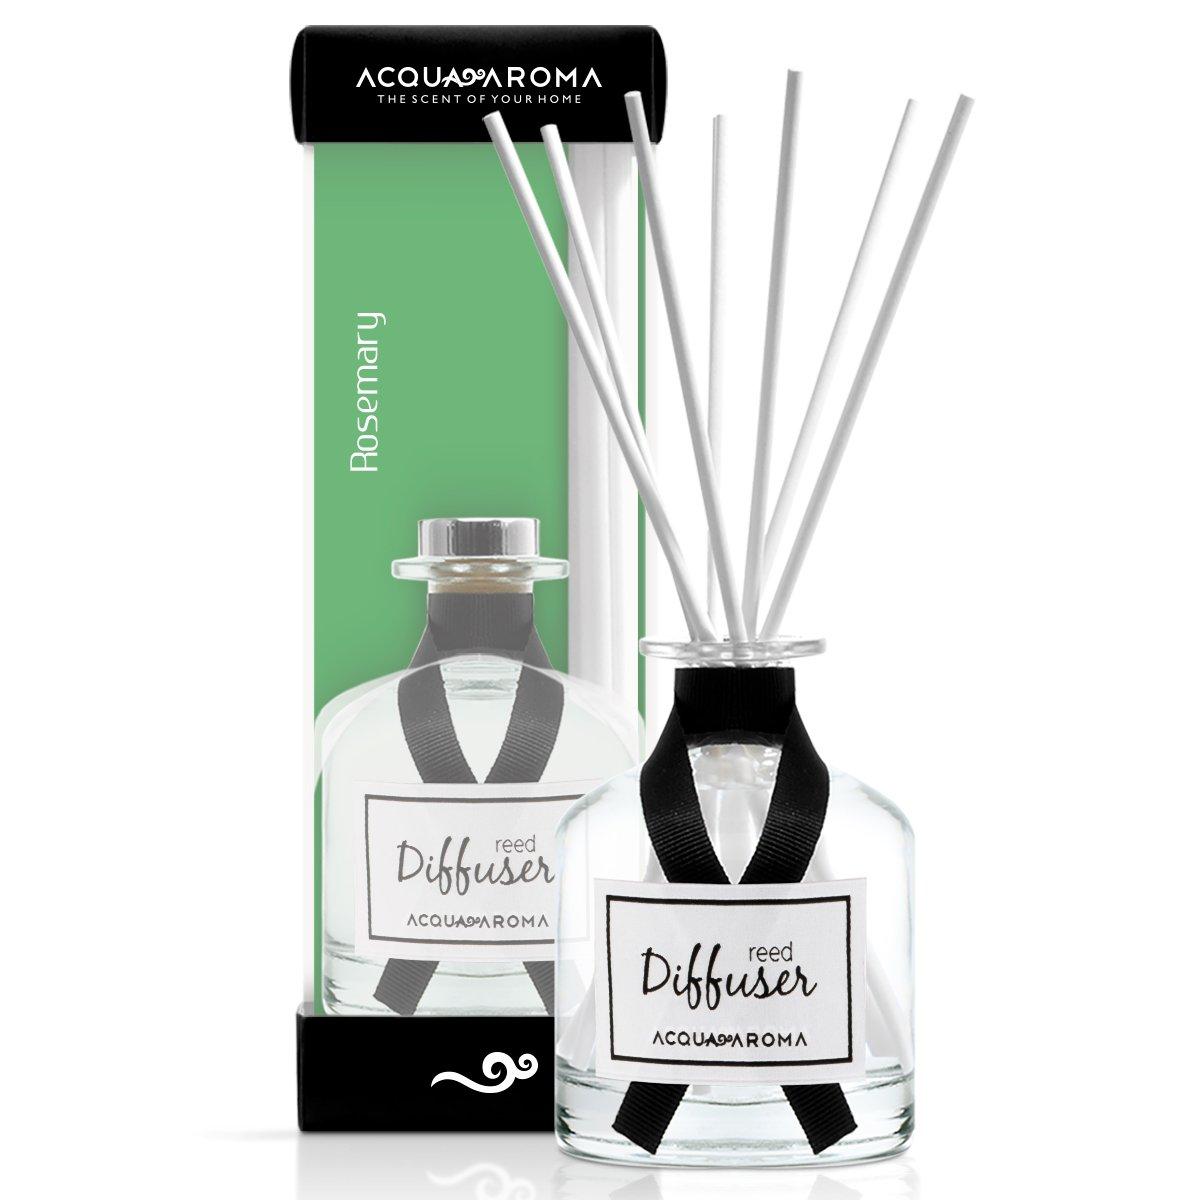 Acqua Aroma Rosemary Reed Diffuser 8.1 FL OZ (240ml)